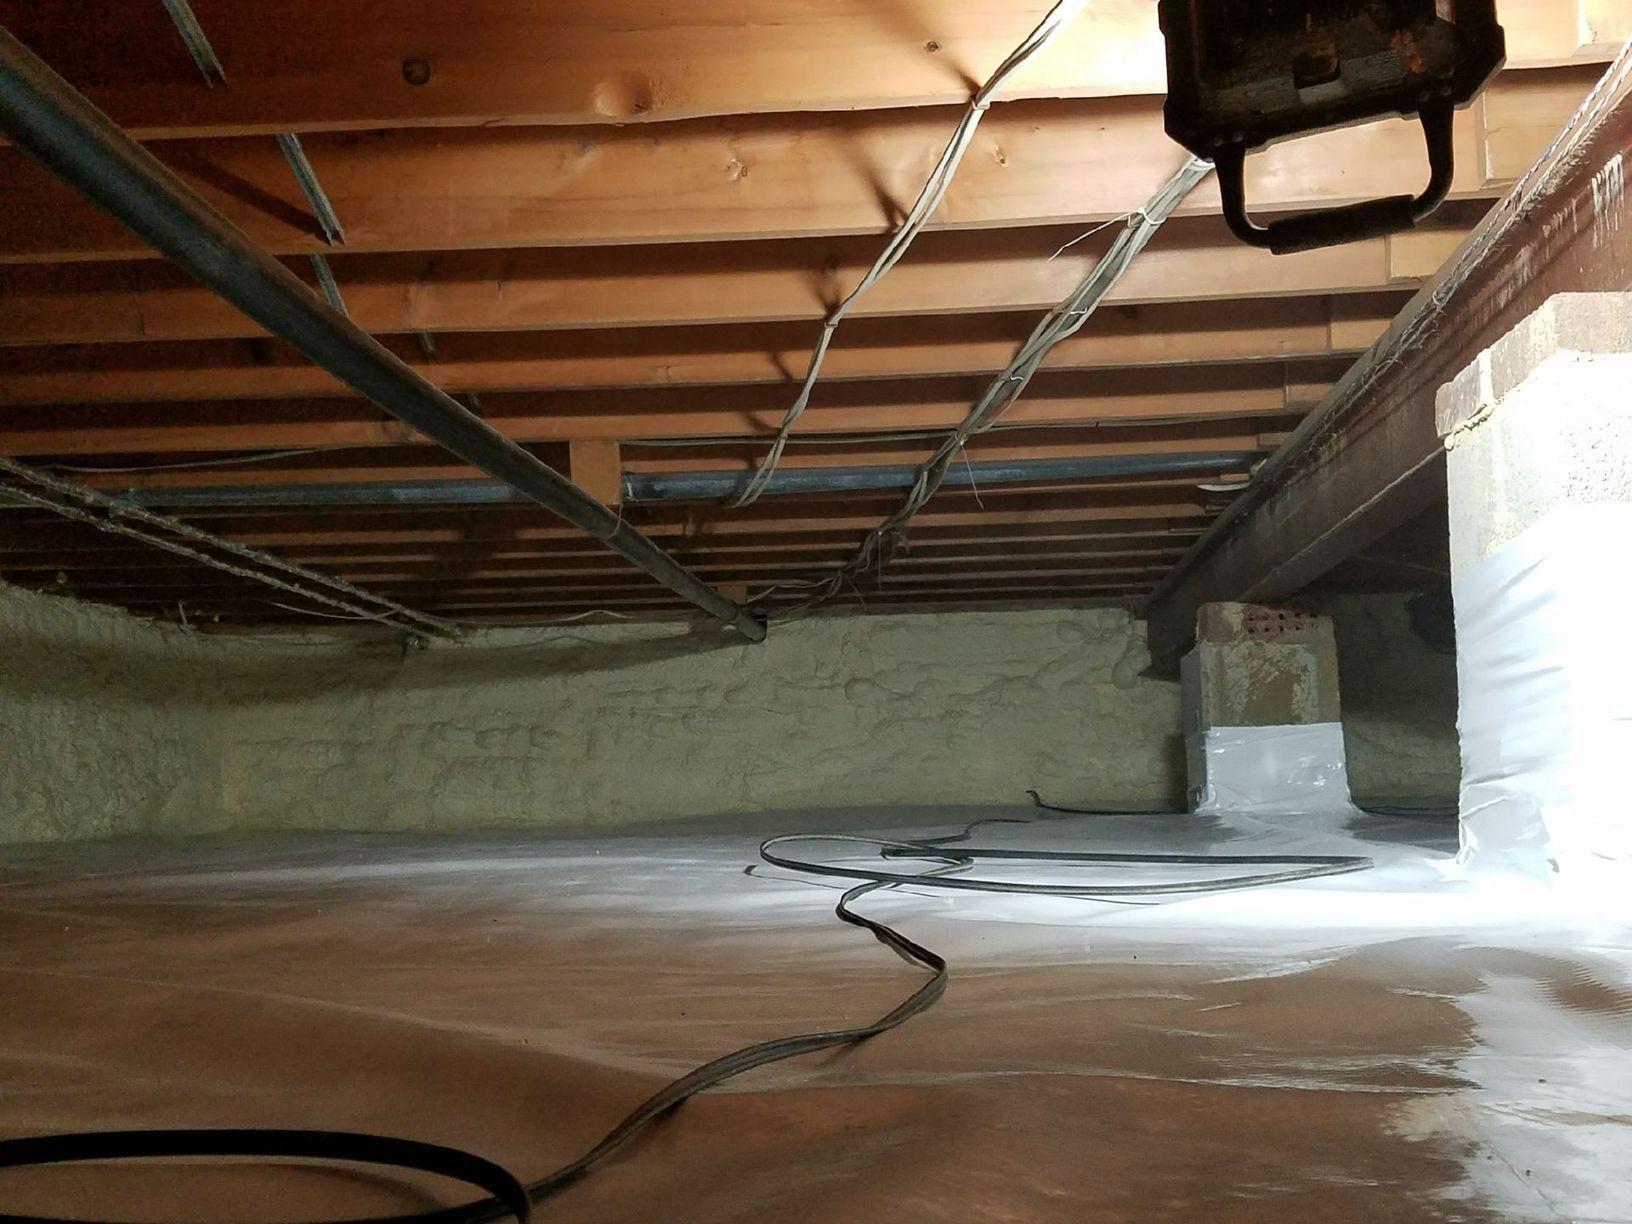 Crawl Space Encapsulation-Culpeper, VA - After Photo